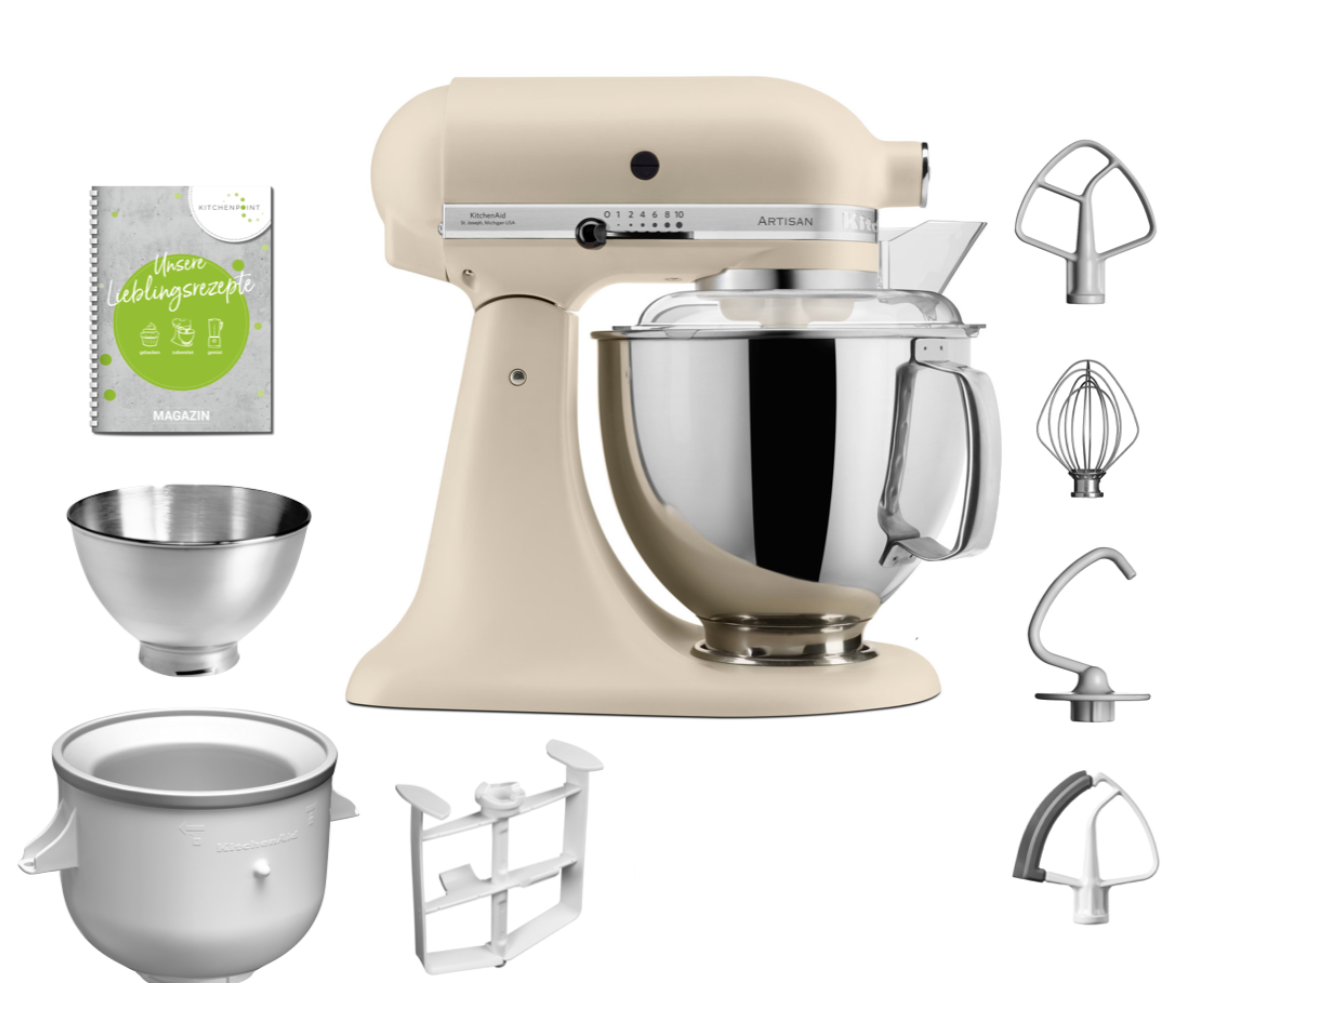 KitchenAid Küchenmaschine 175 - Eis Set FreshLinen